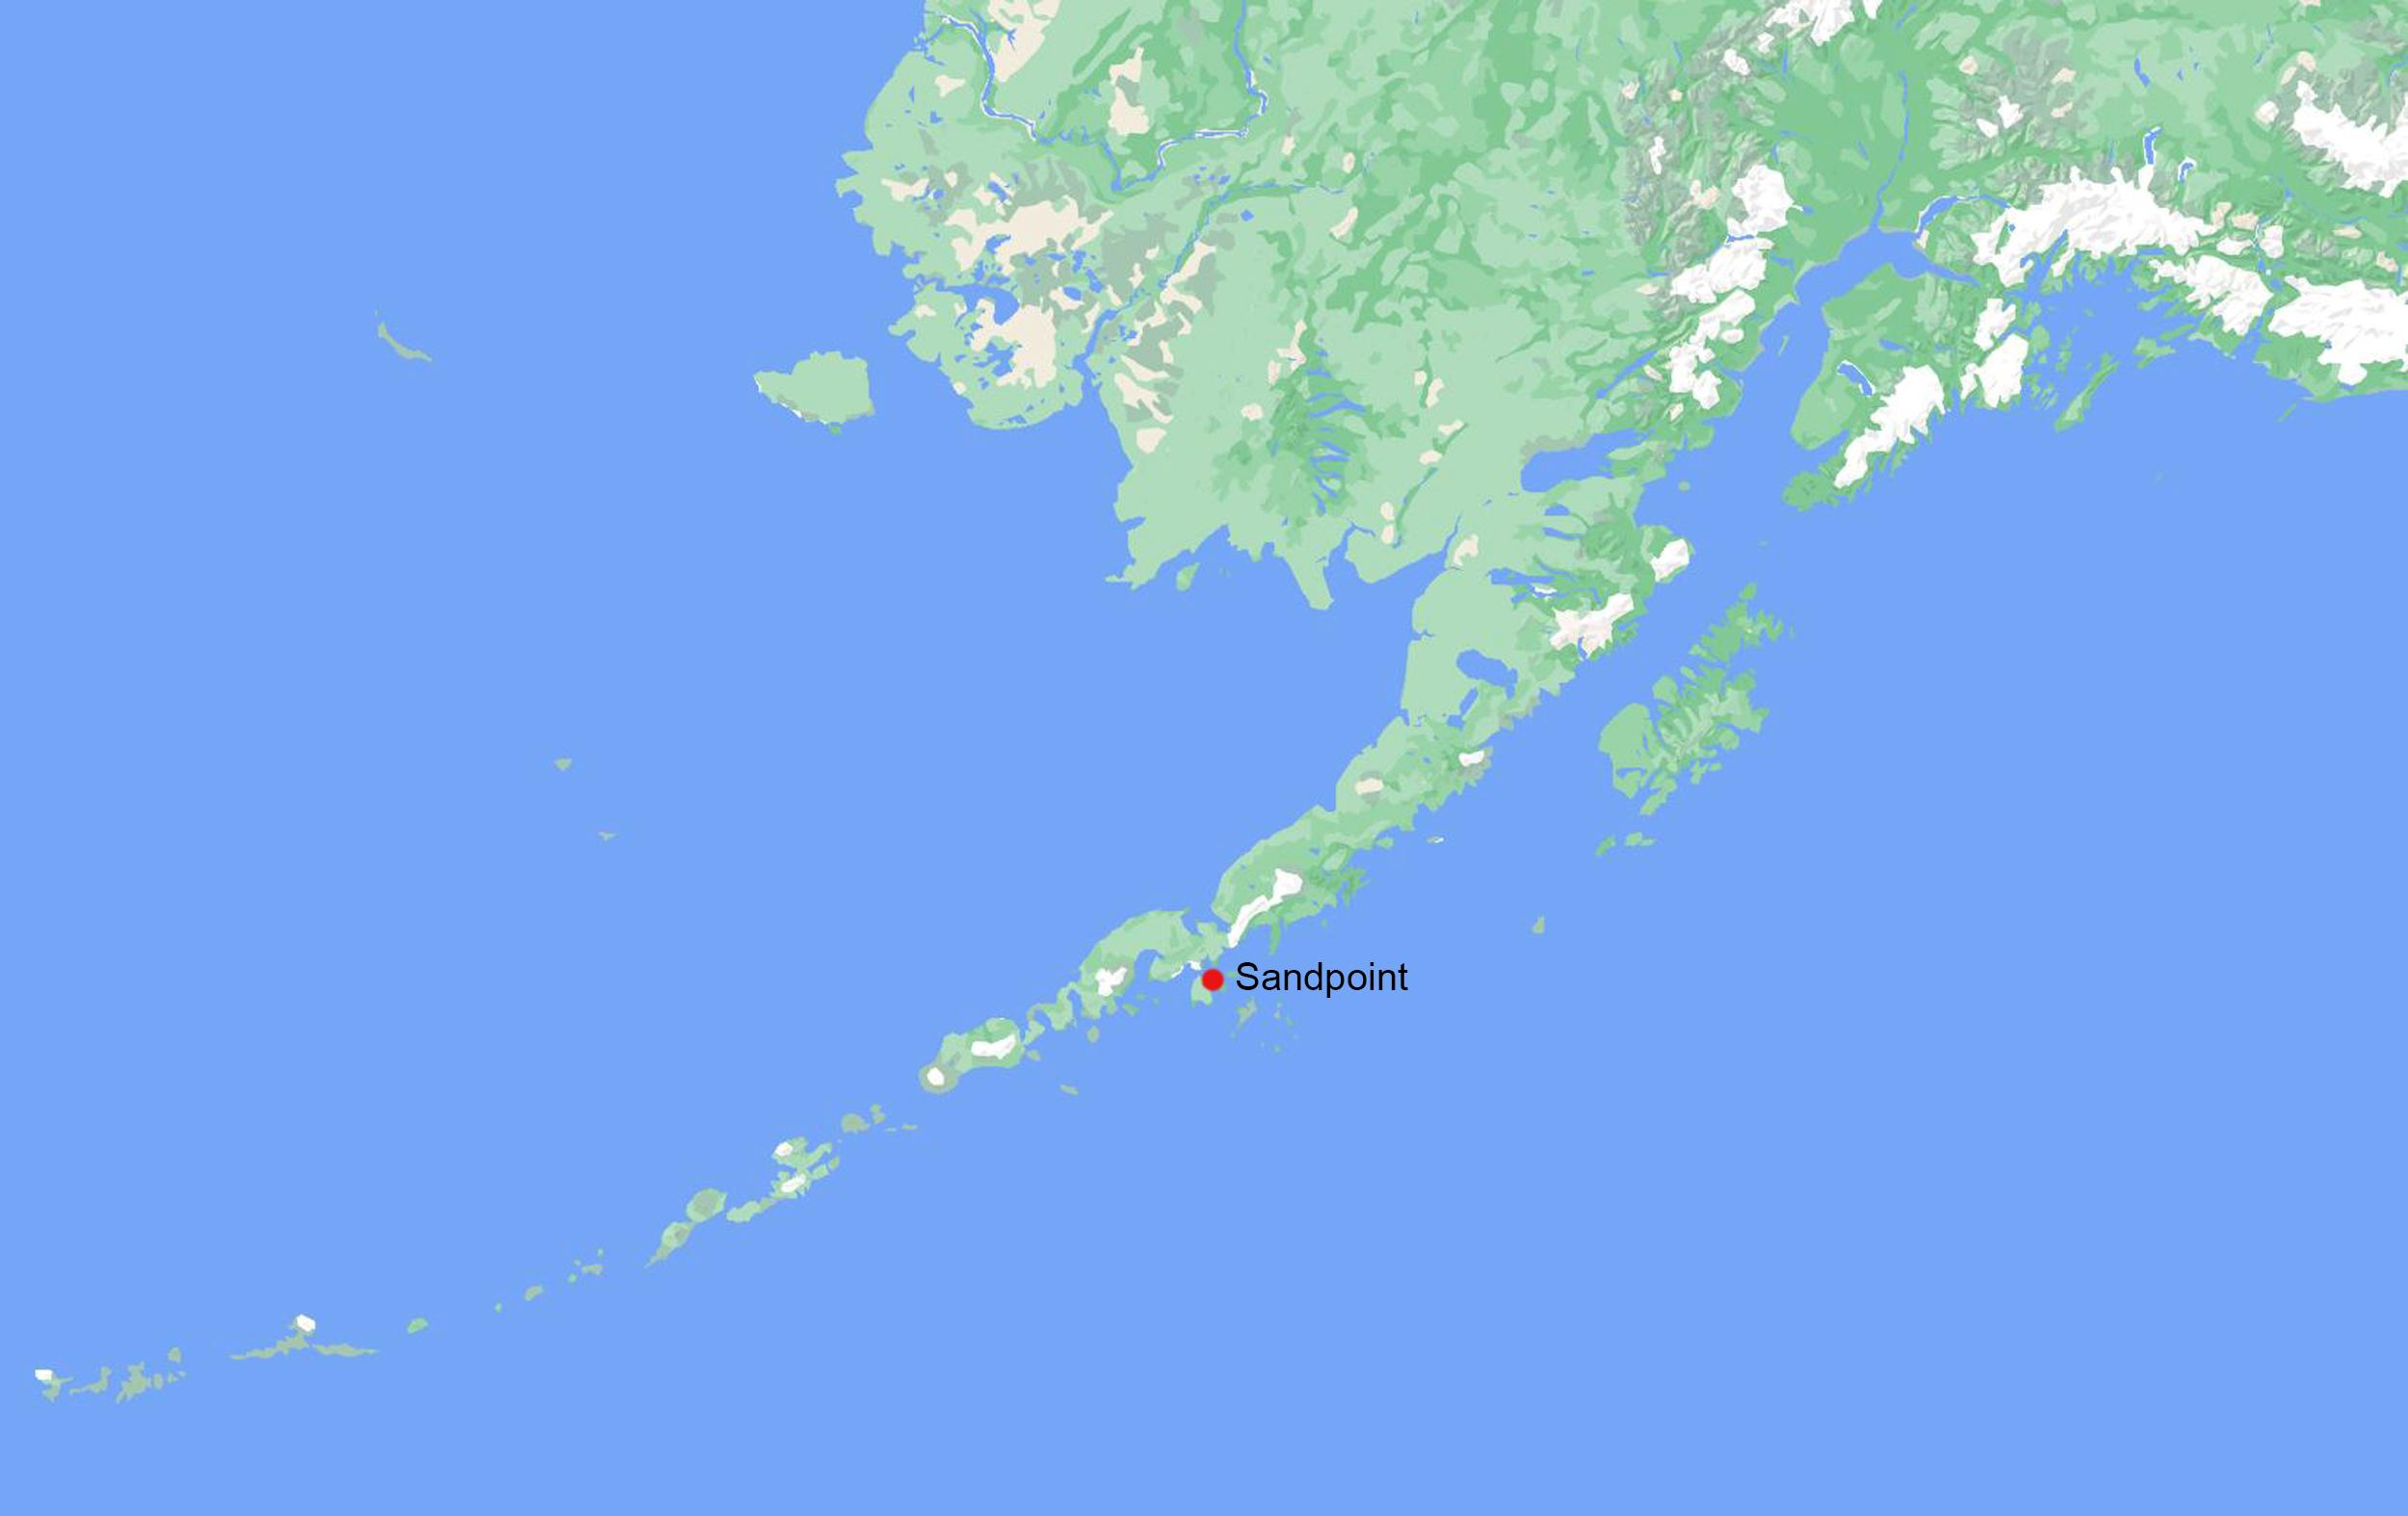 Magnitude 8.2 earthquake strikes off Alaska